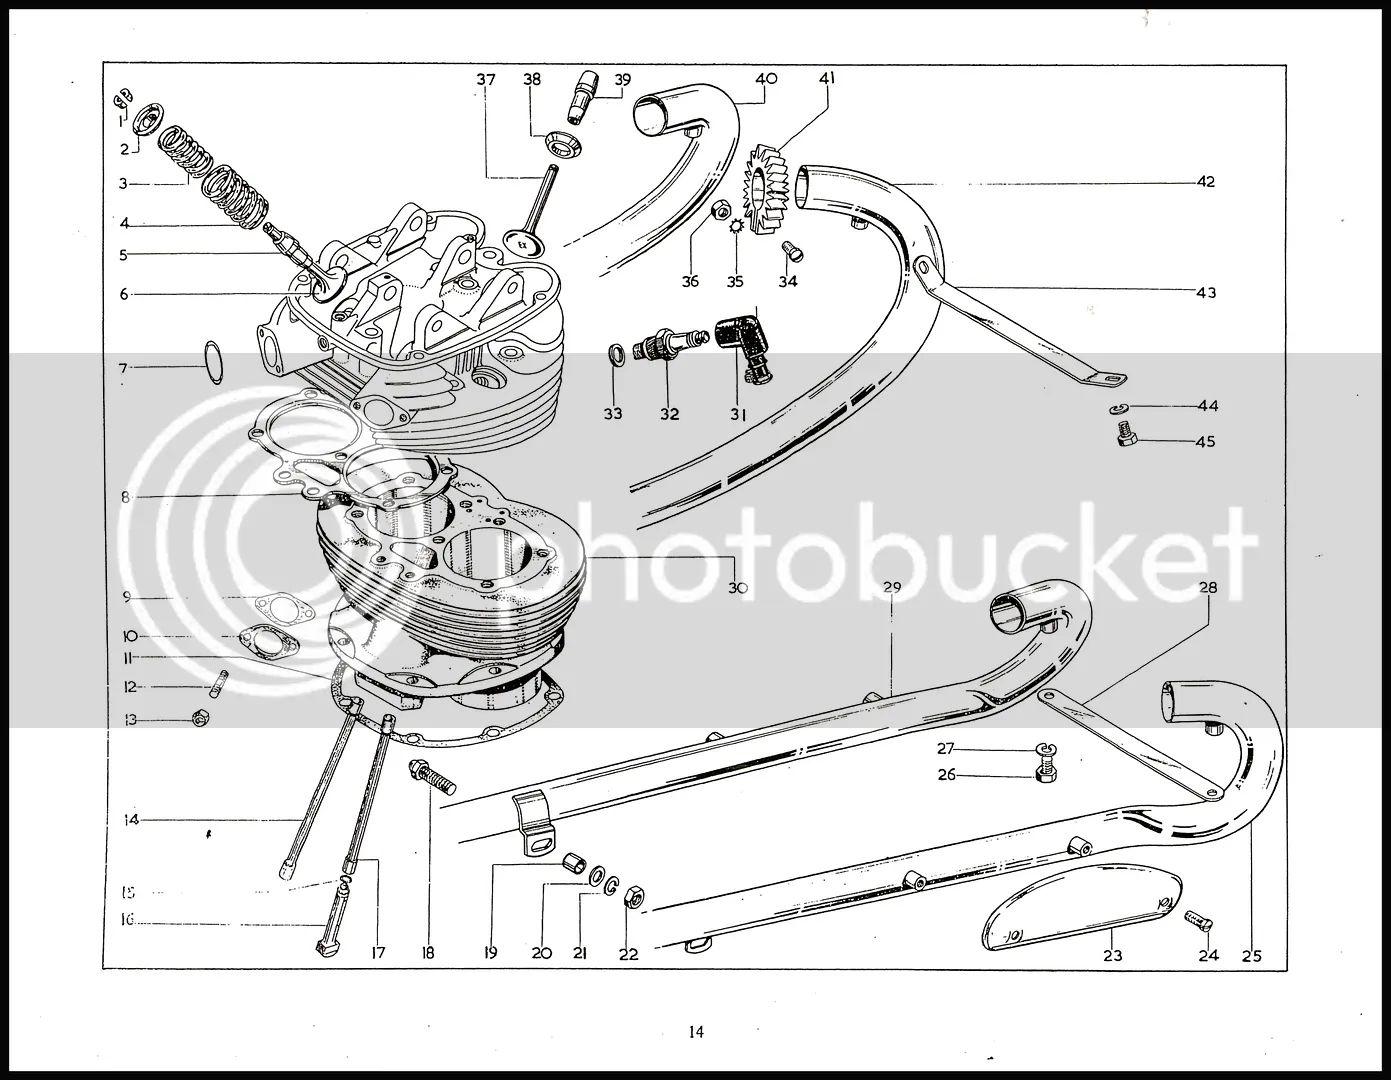 1973 pontiac ventura wiring diagram